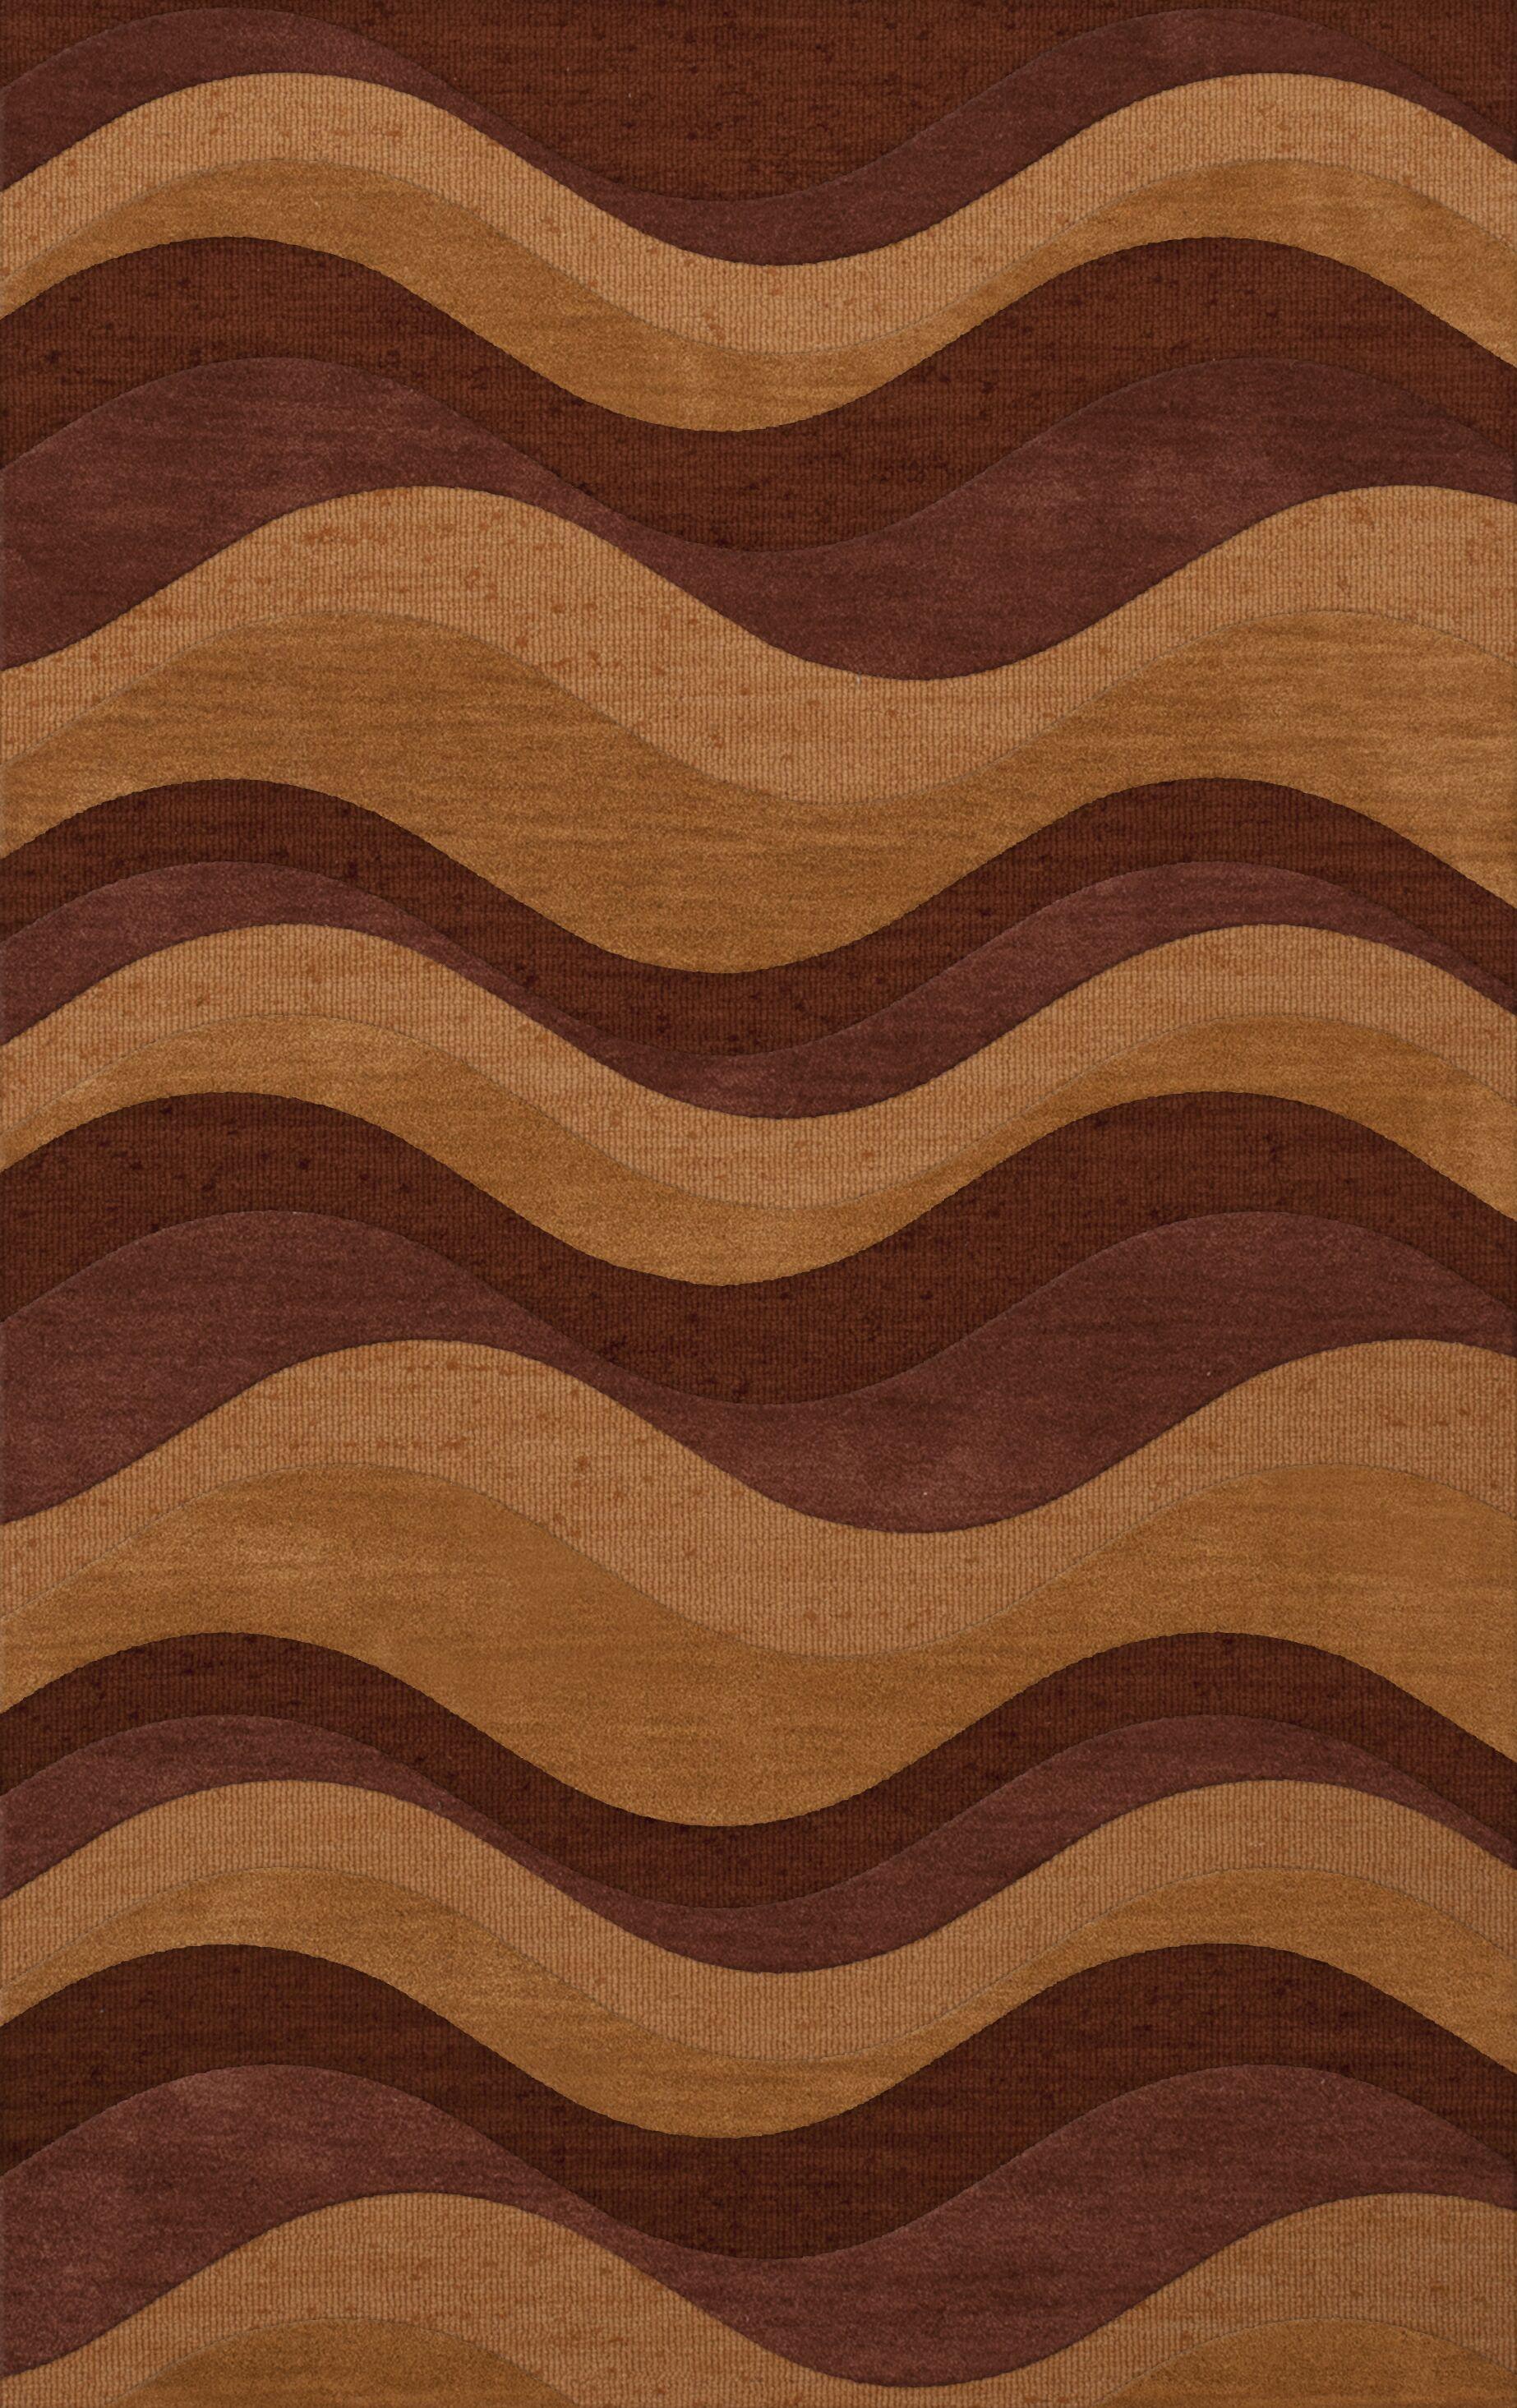 Halley Wool Harvest Area Rug Rug Size: Rectangle 12' x 18'